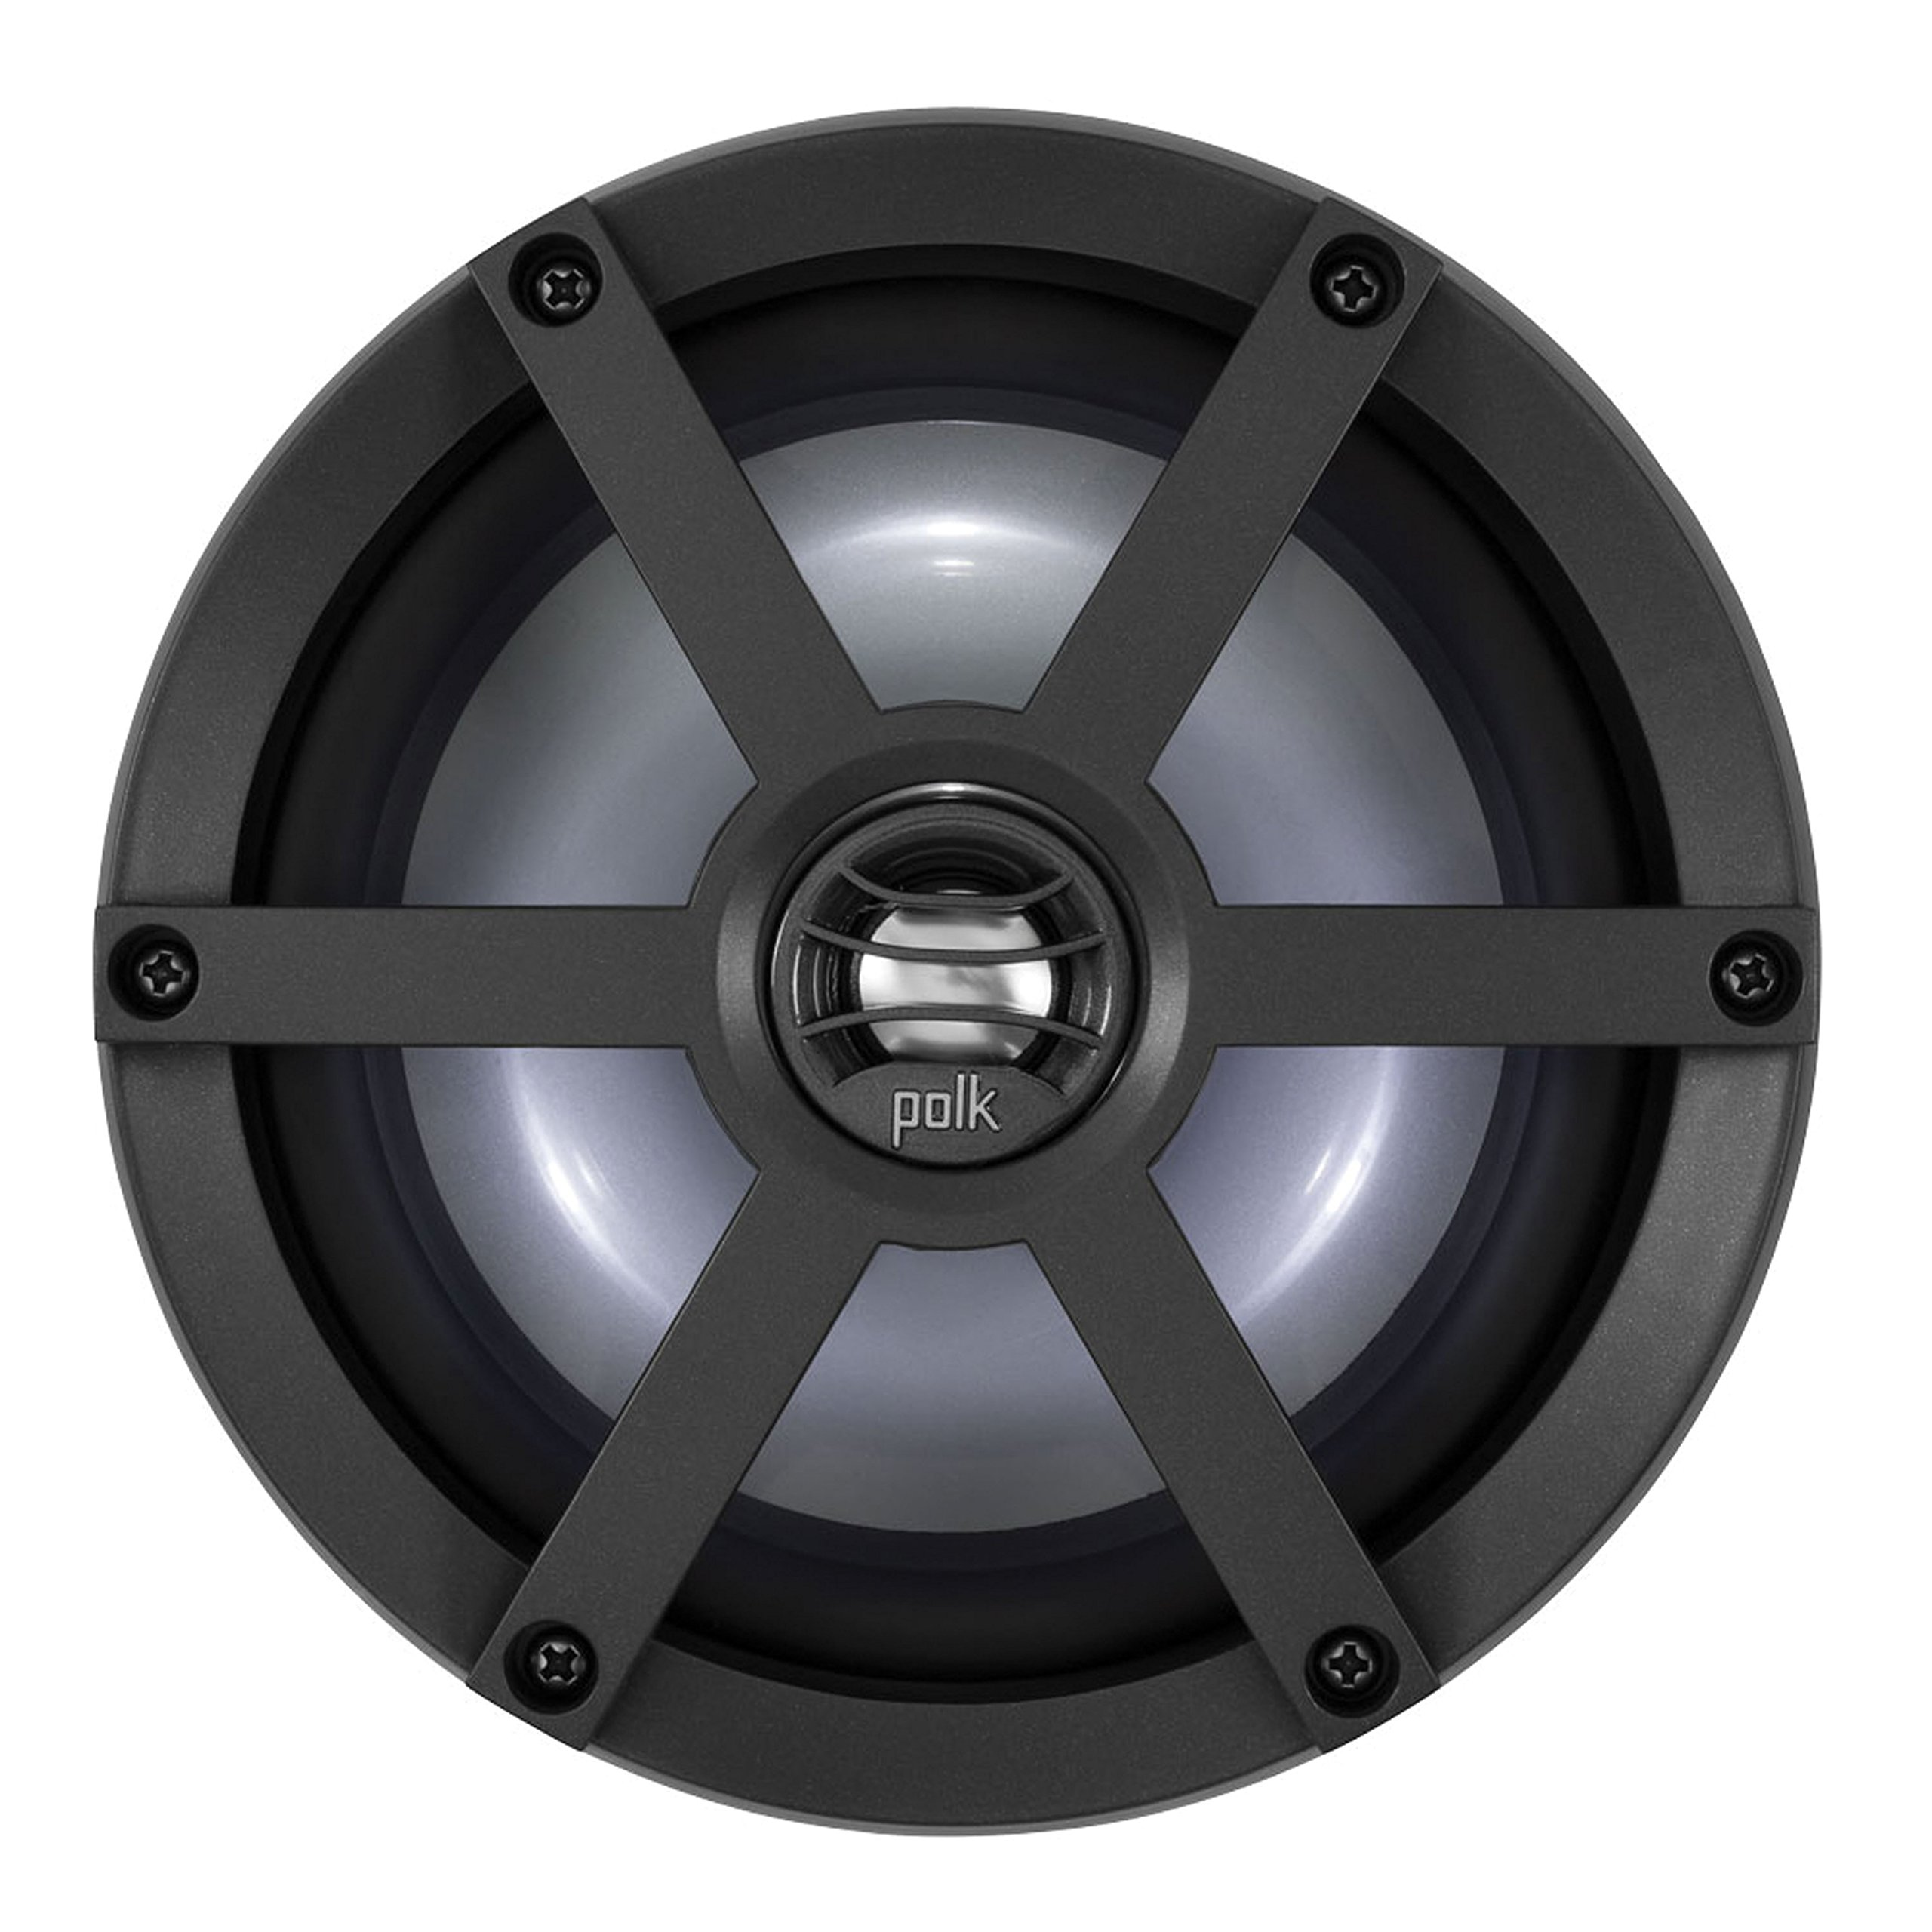 POLK AUDIO UM650SRTL Coaxial Speaker Kit with Sport Grille and LED Light Ring - 6.5'',2 Pack